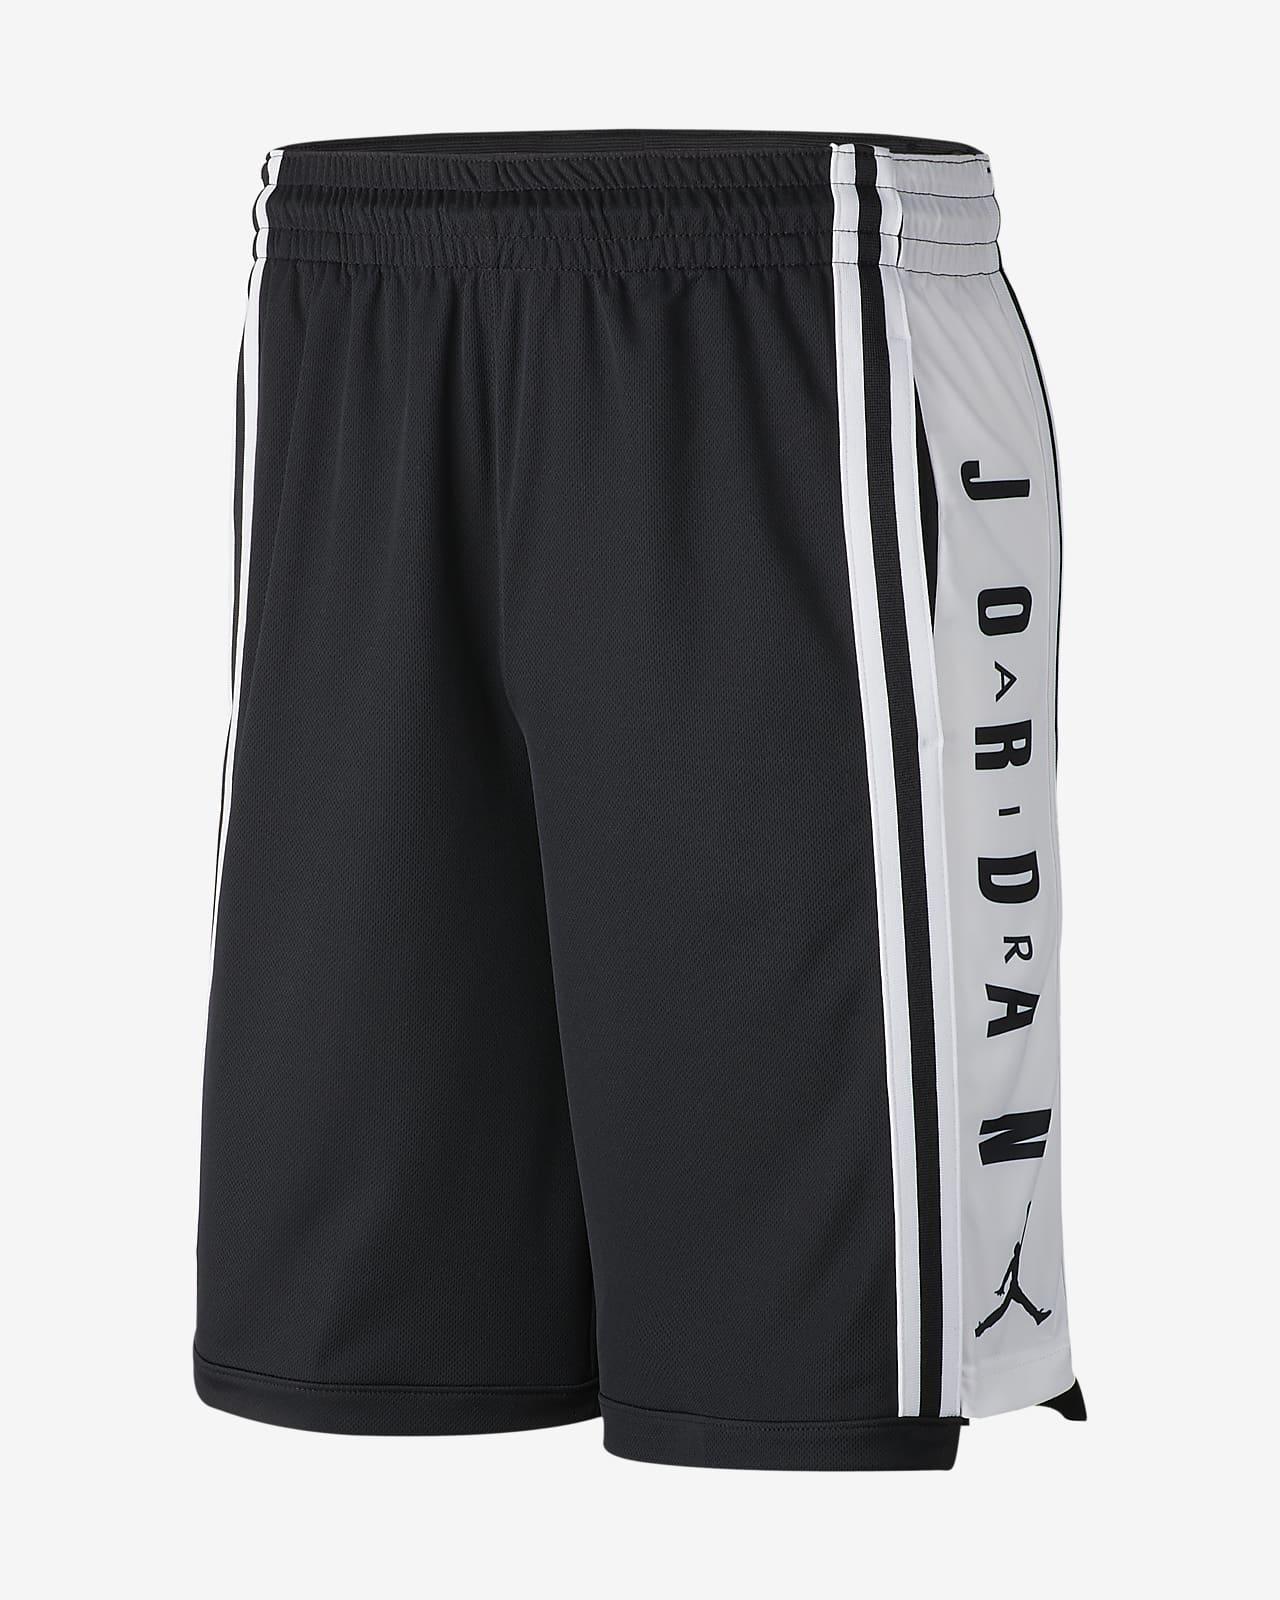 Jordan Men's Basketball Shorts. Nike LU